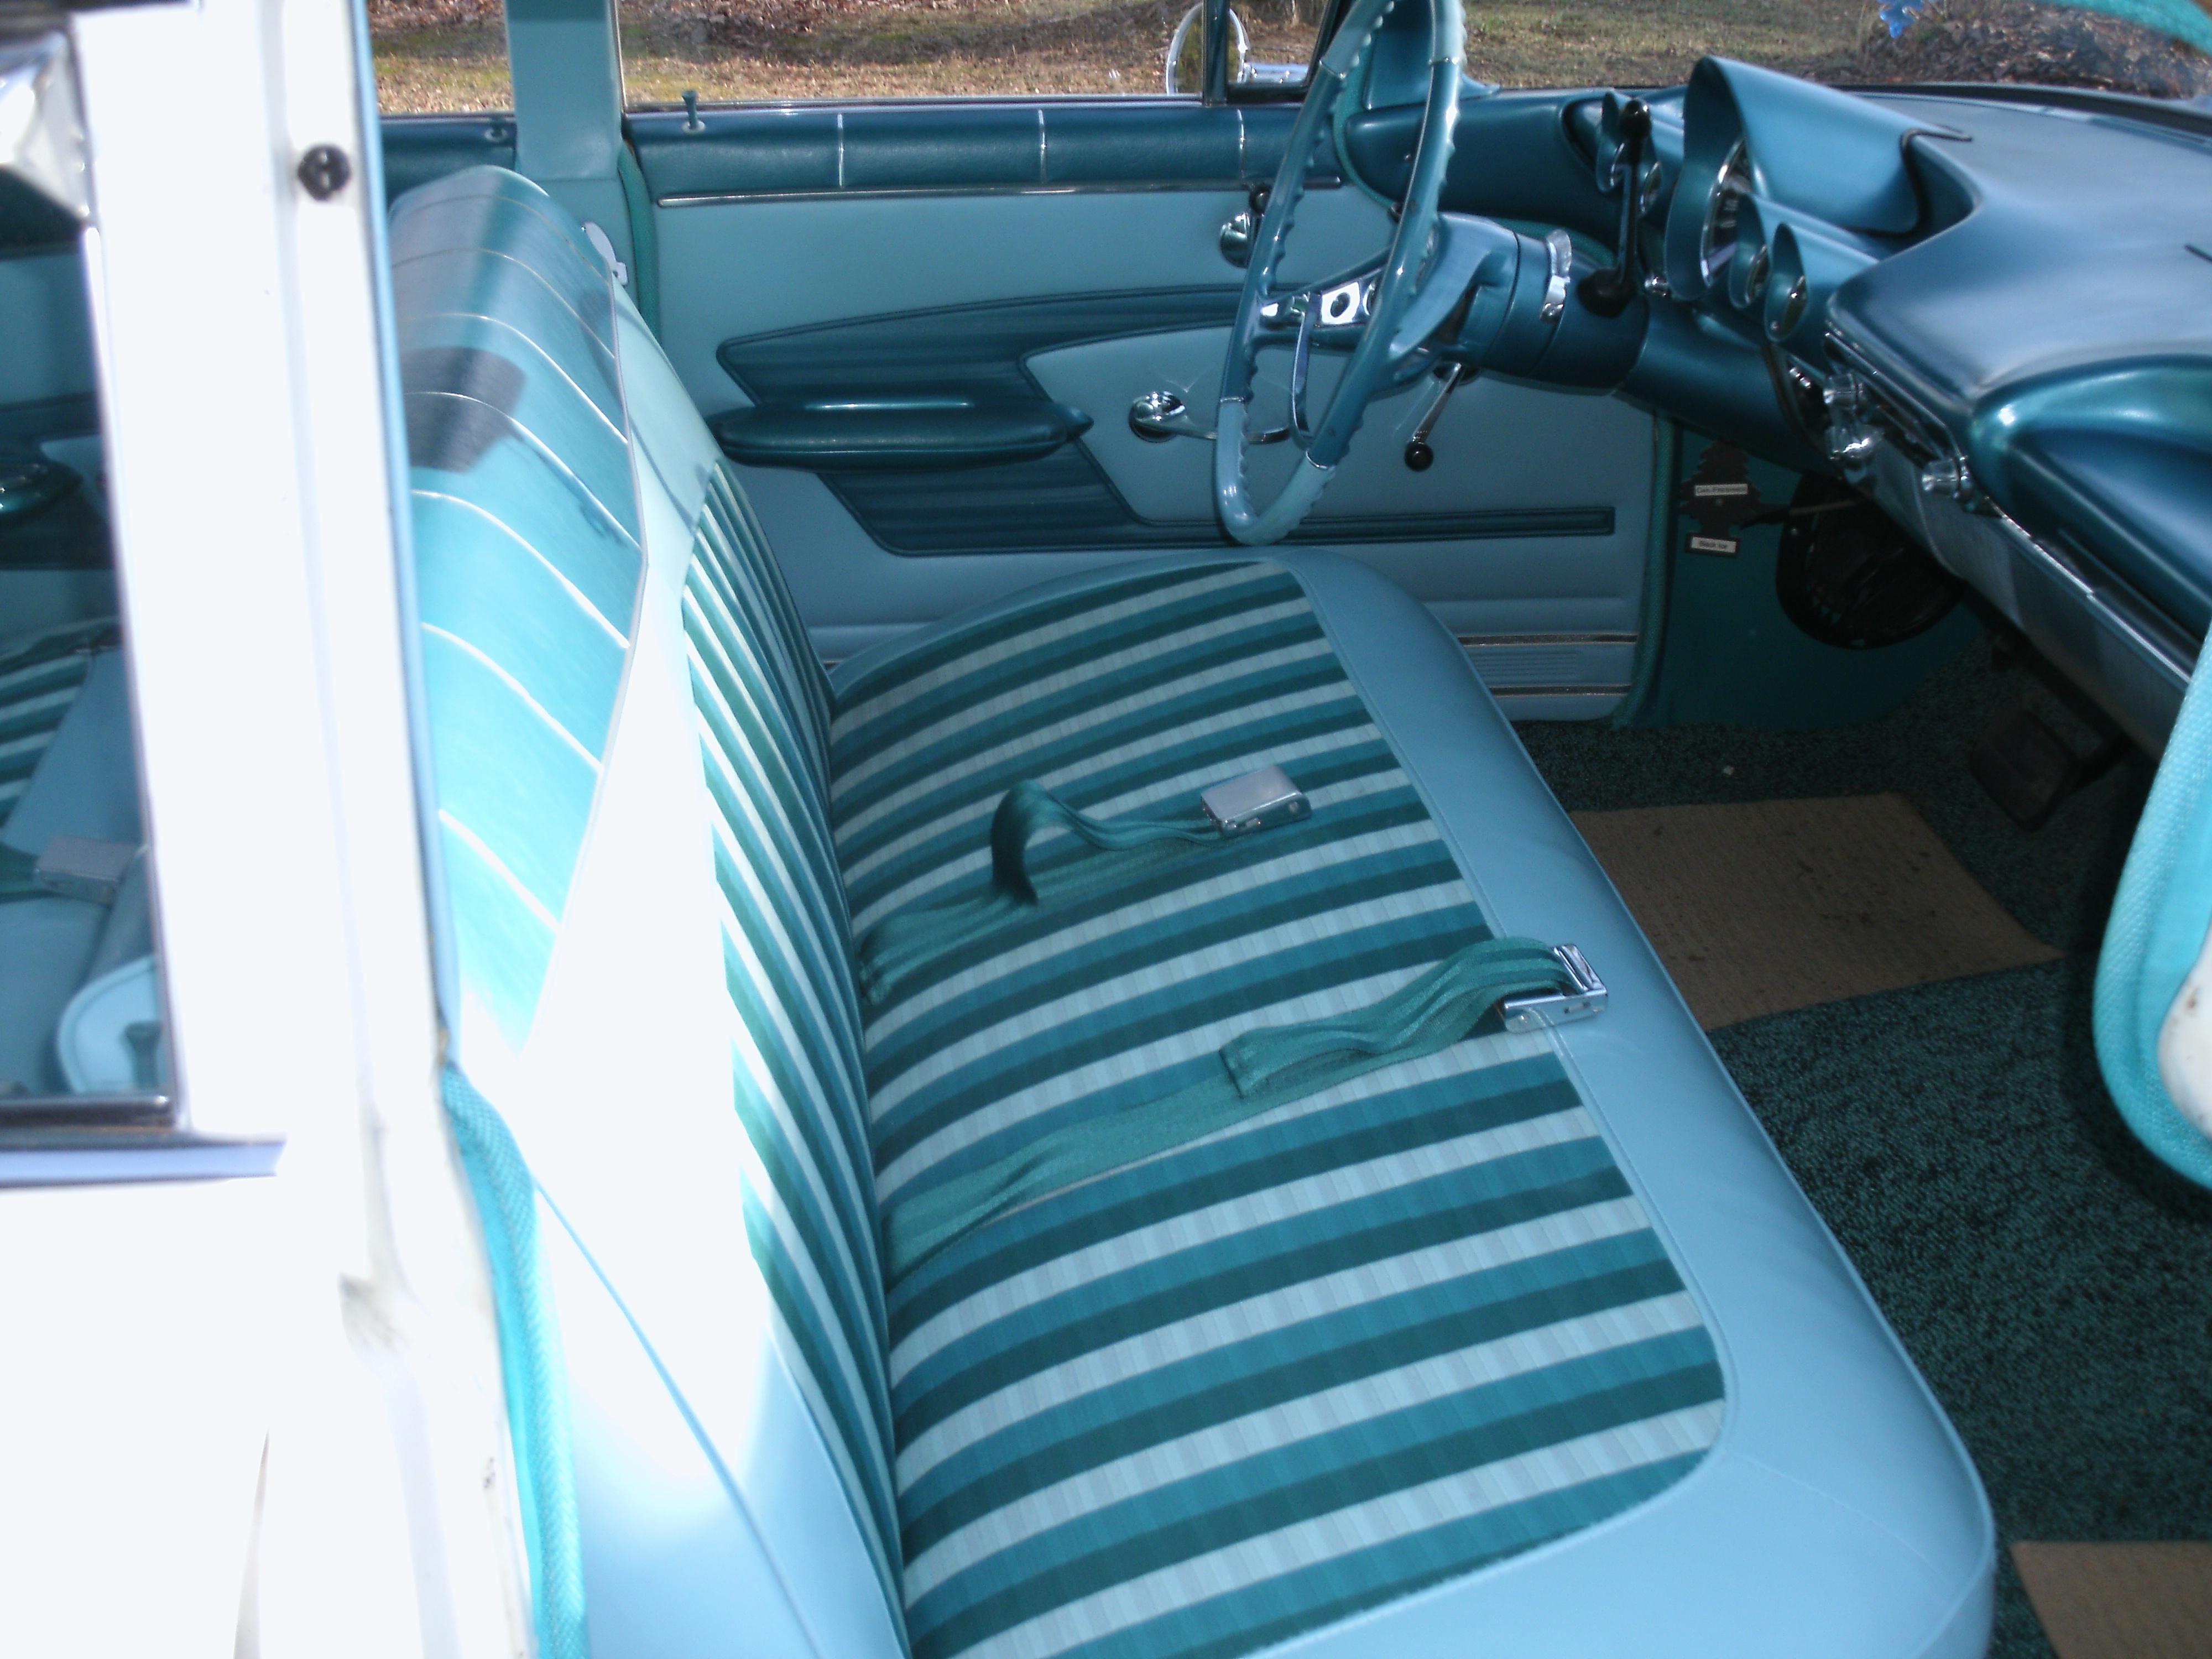 chevrolet impala 1959 a vendre 622566chevroletimpala1959019